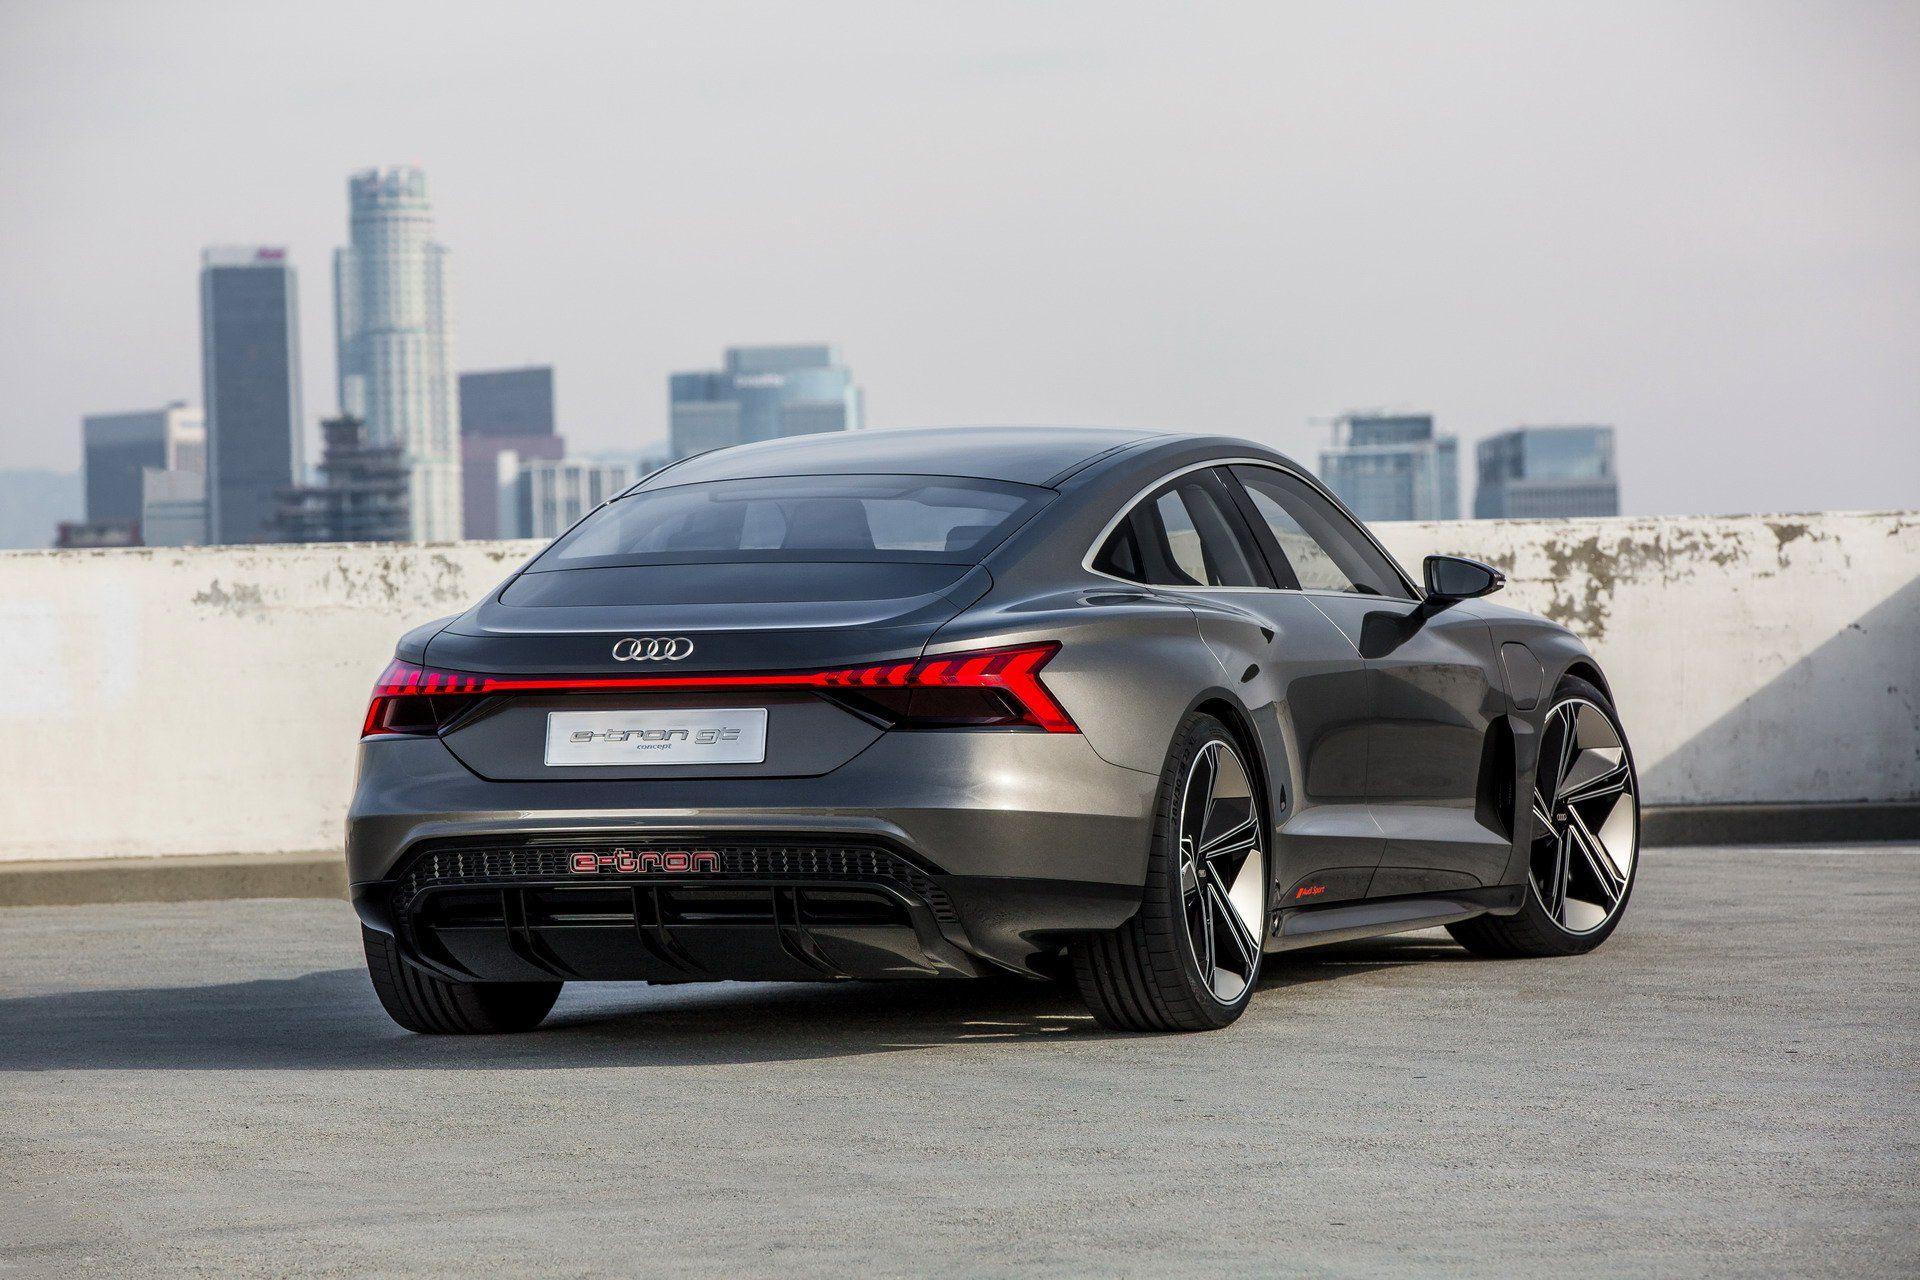 Audi E Tron Gt Is An Electrifying Super Sedan That S Coming In 2020 Carscoops Audi E Tron Porsche Taycan E Tron